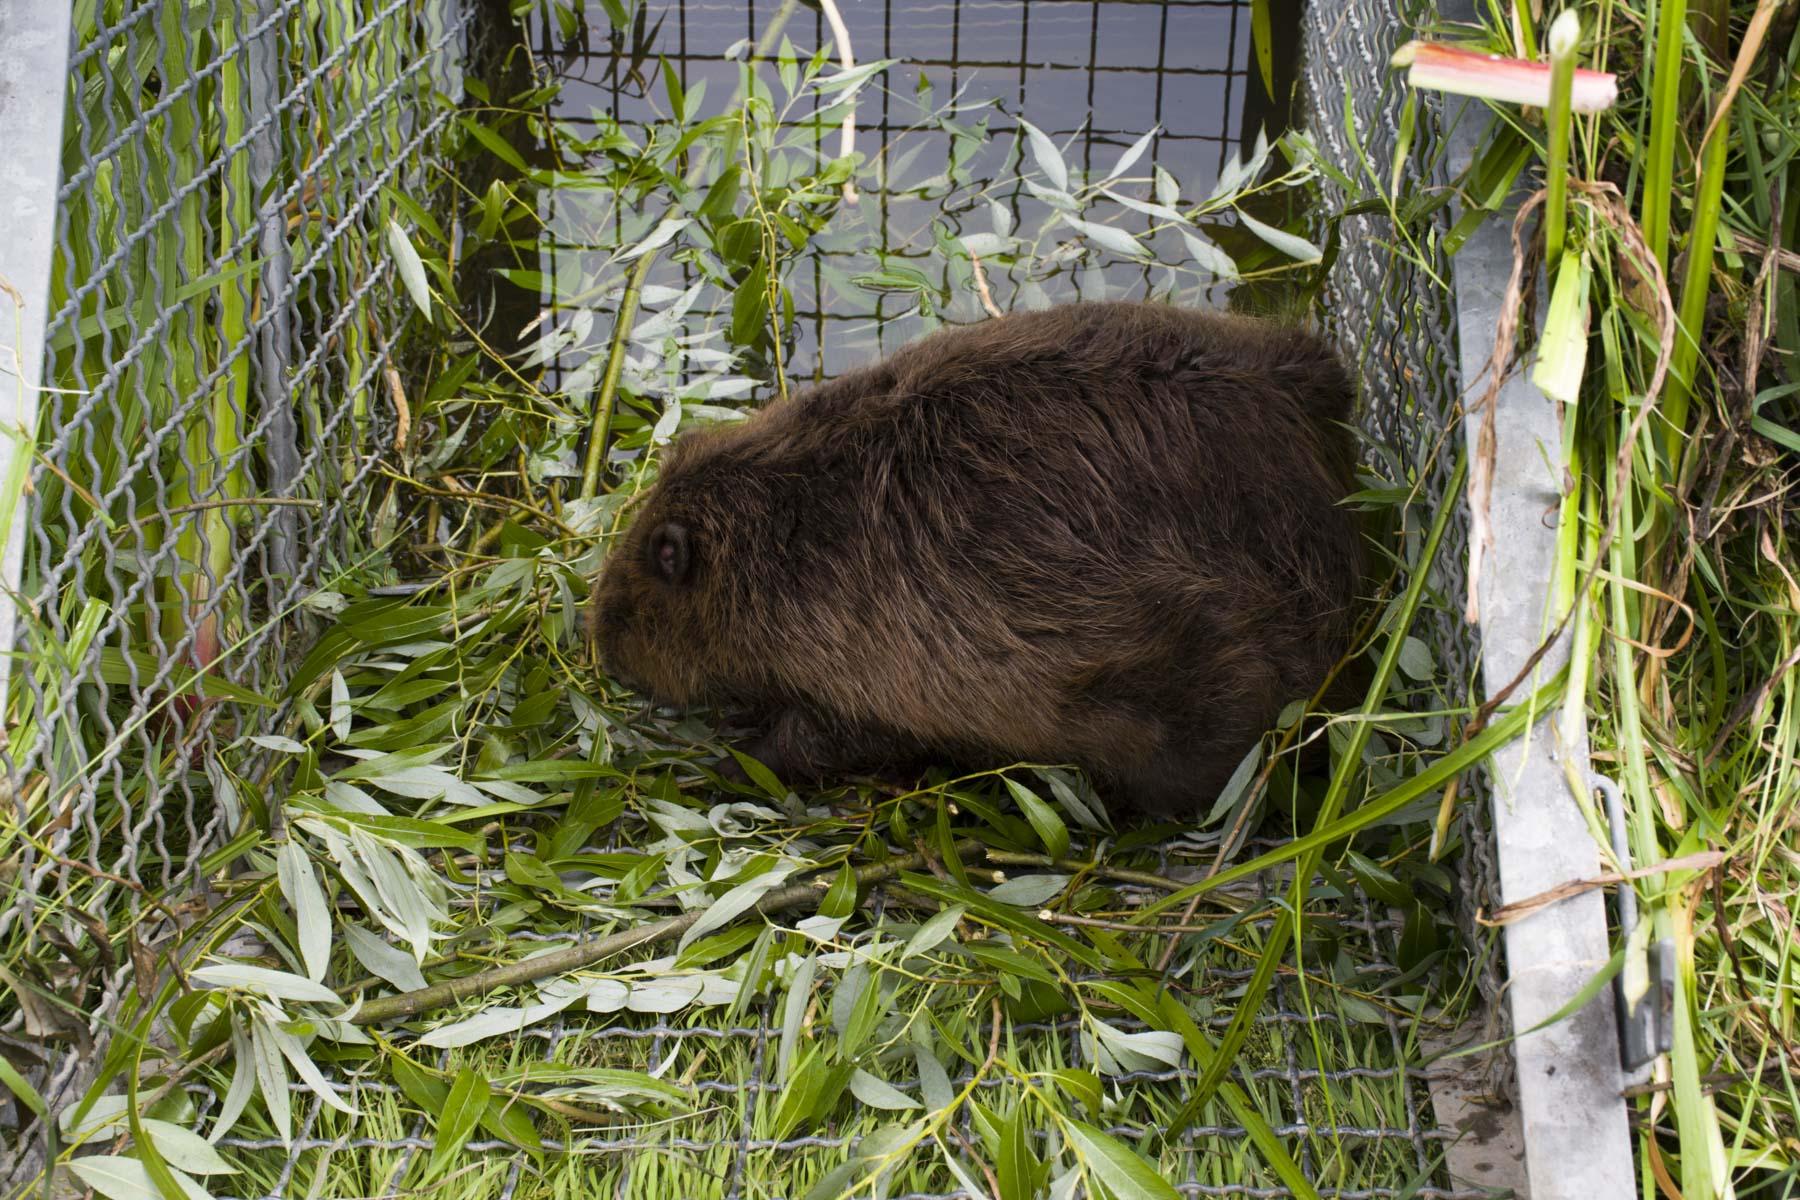 Our friend beaver. Visit Zasavica